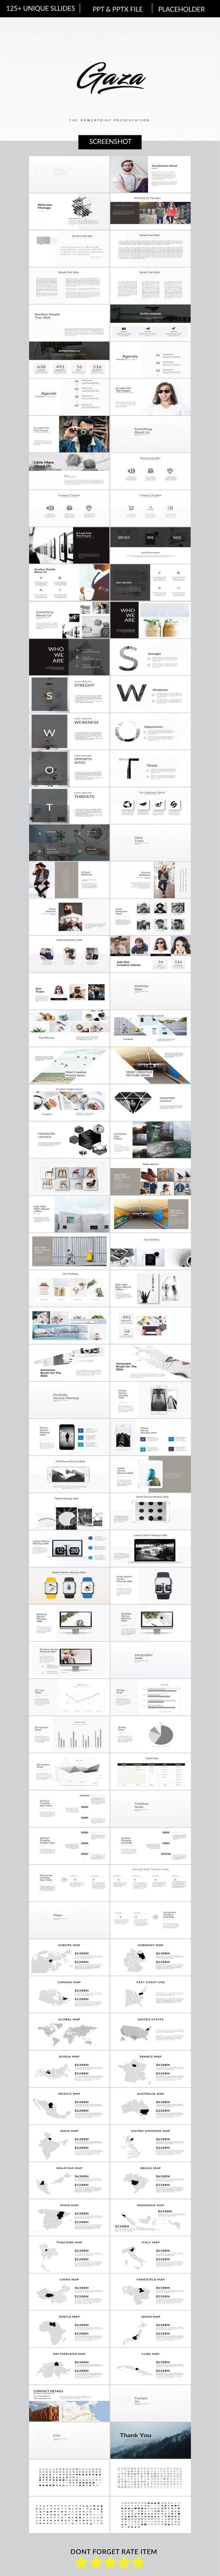 Gaza Multipurpose Business Powerpoint - PowerPoint Templates Presentation Templates